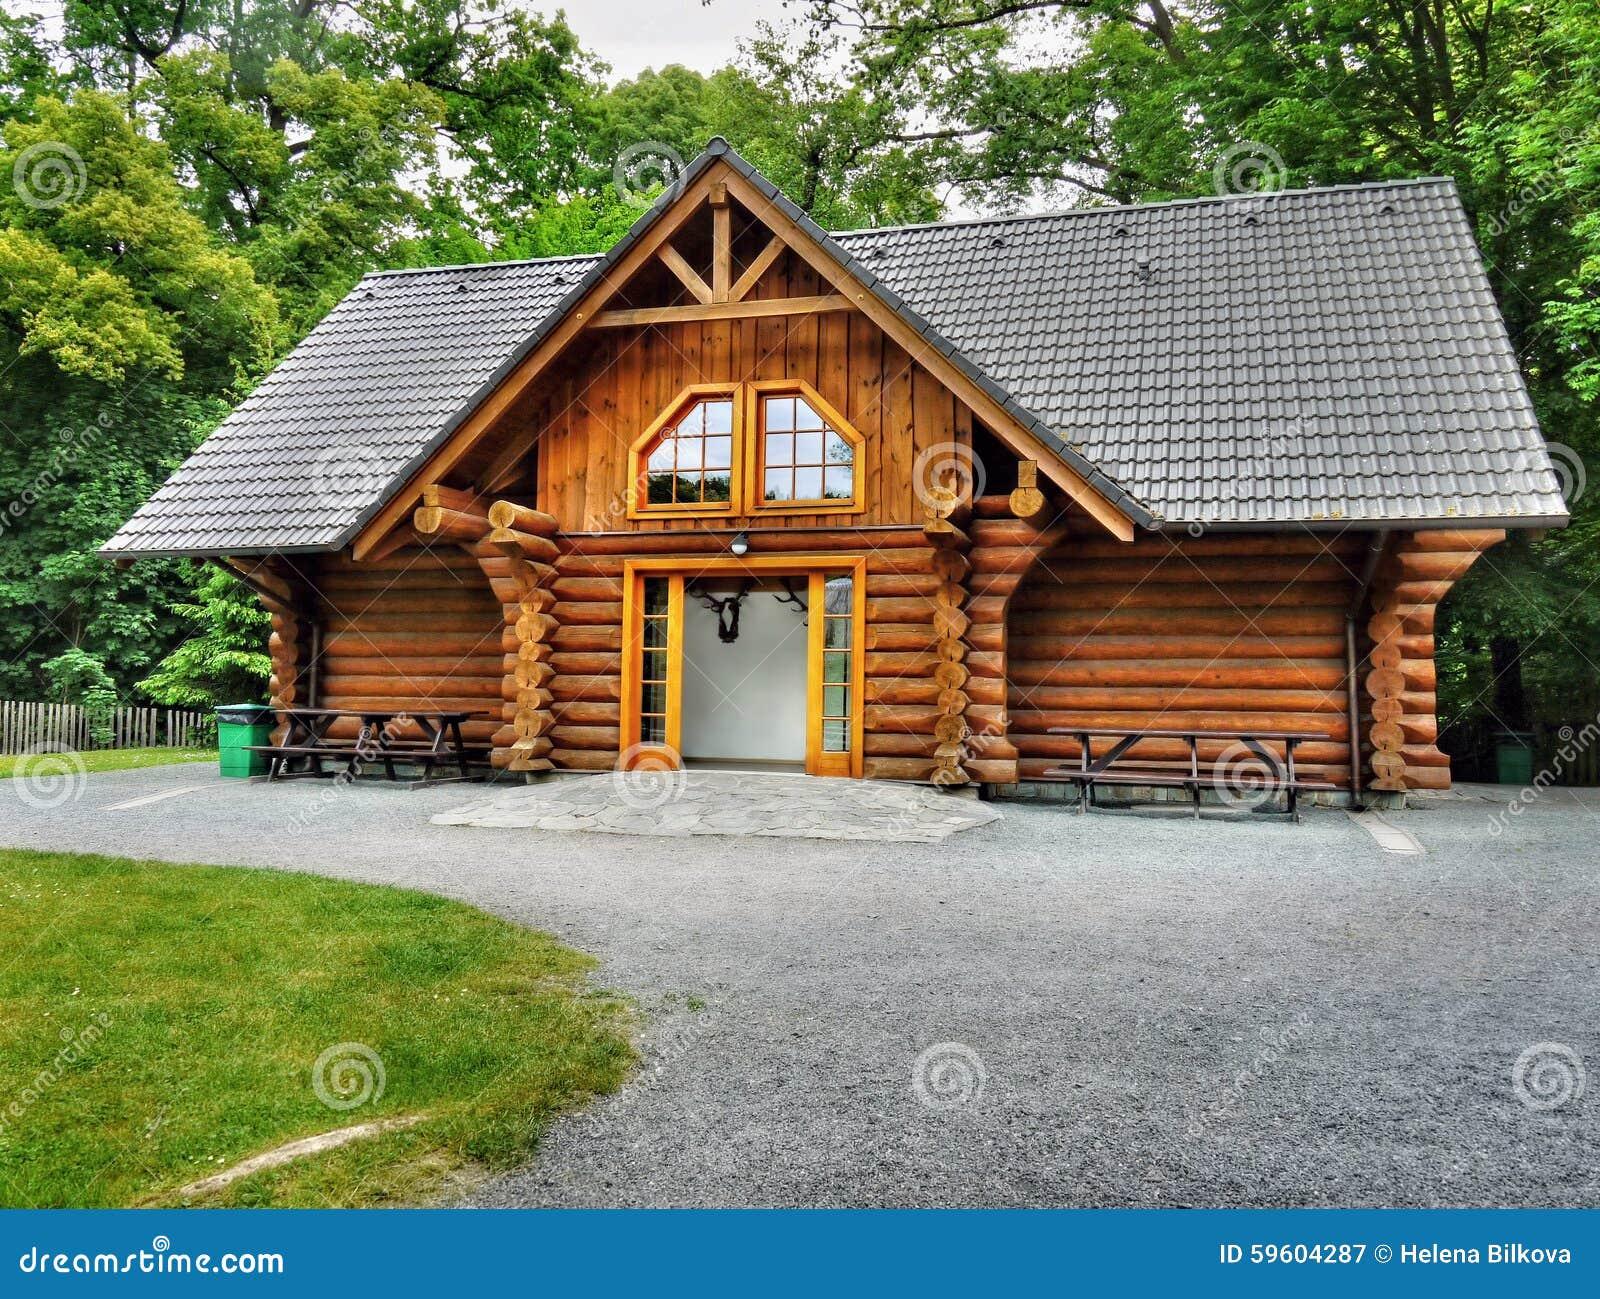 10 best wisconsin dells cabins cabin rentals with photos